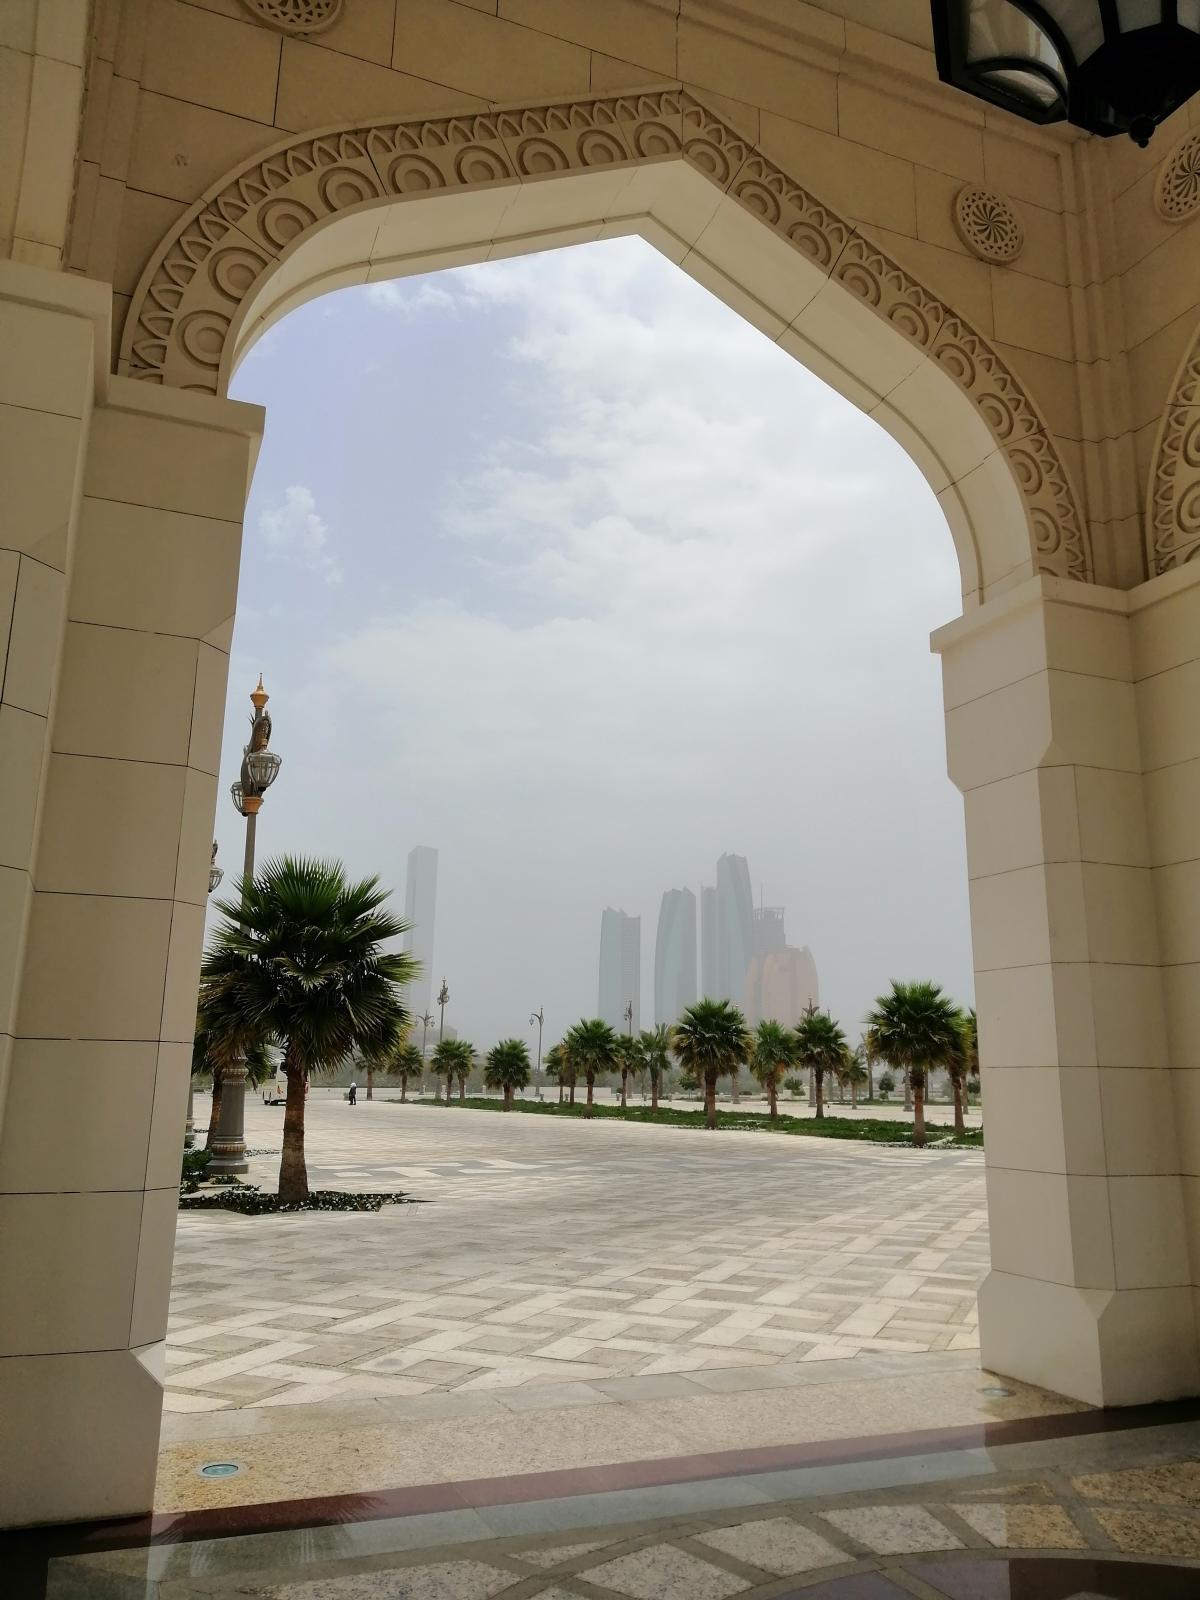 Абу-Даби - город контрастов / Фото Нина Жильцова